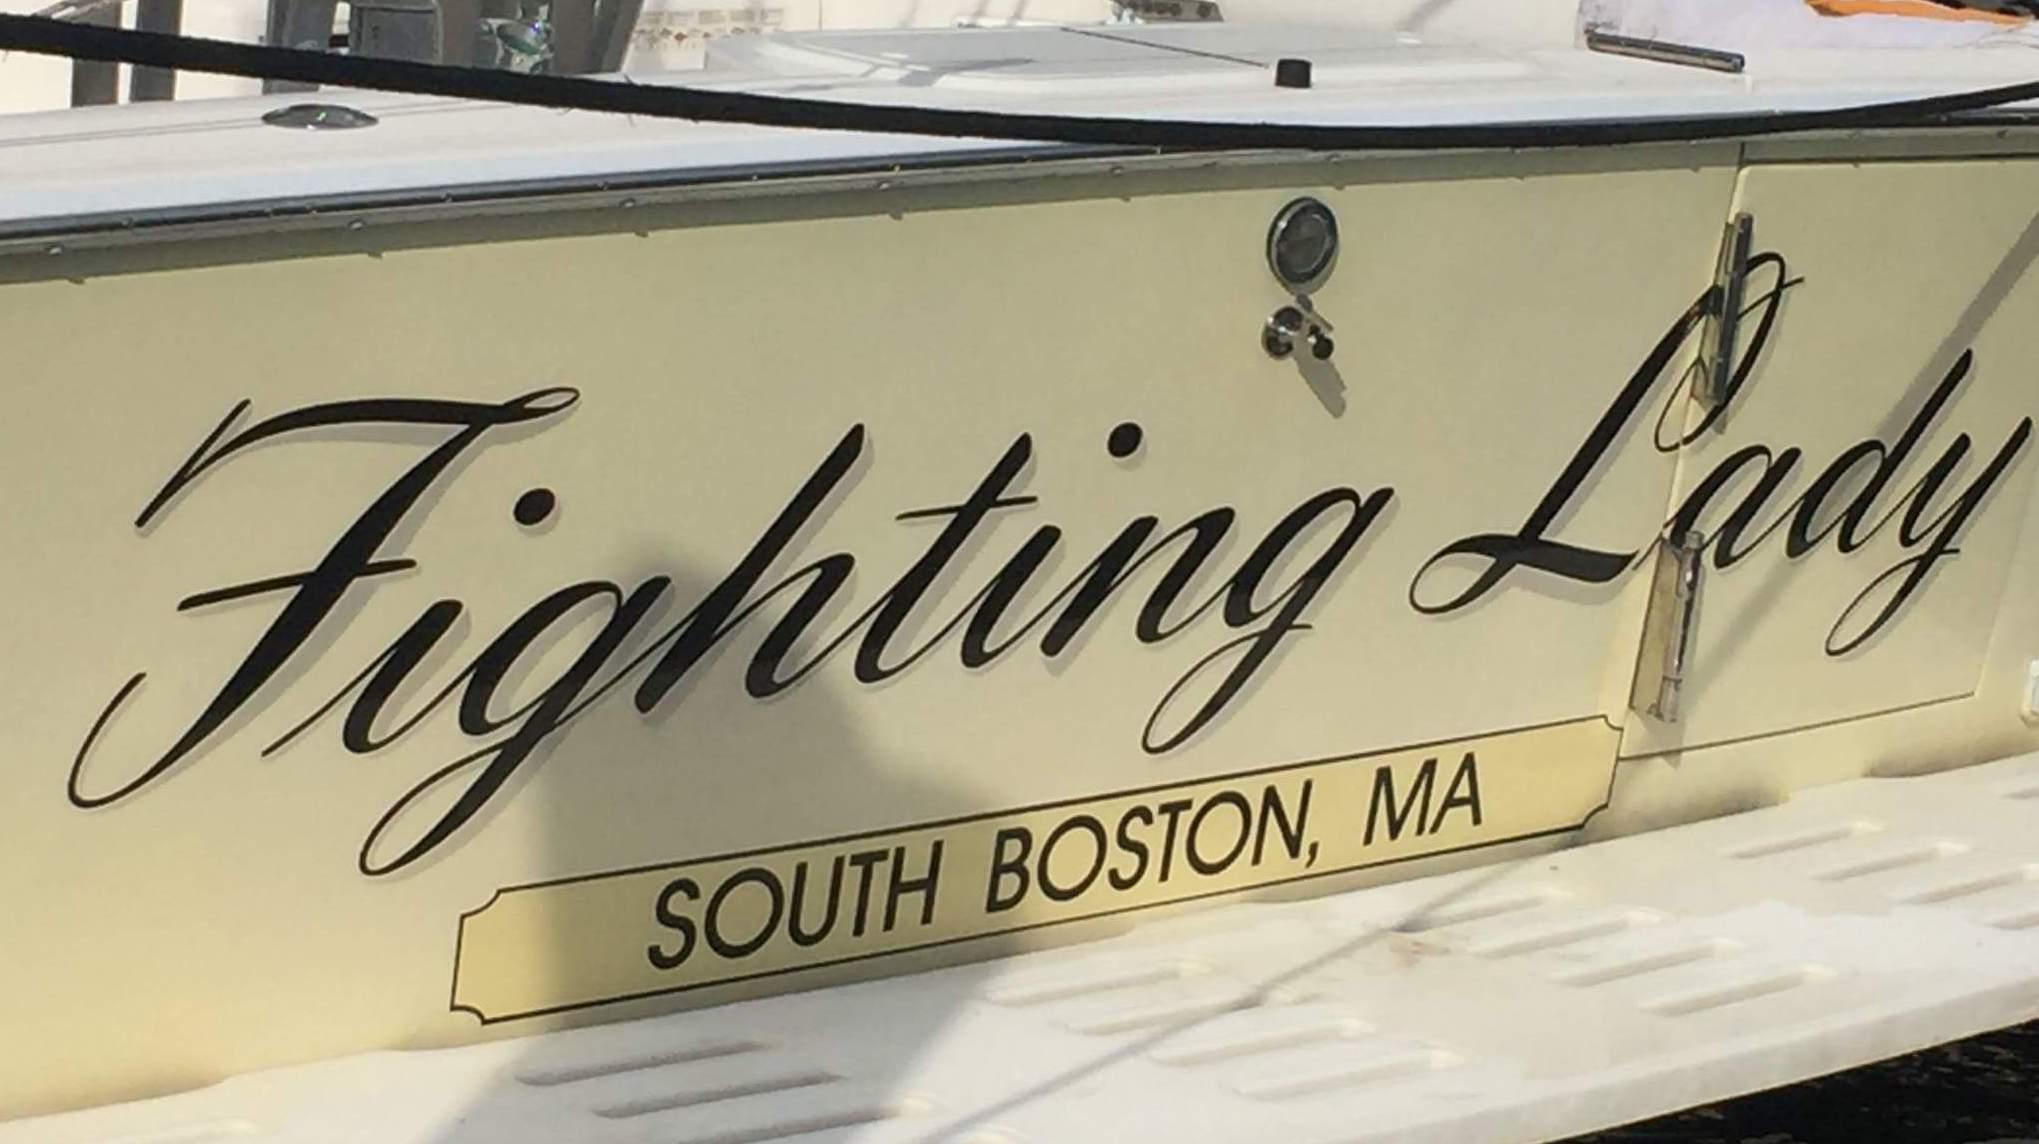 Fighting Lady.jpg